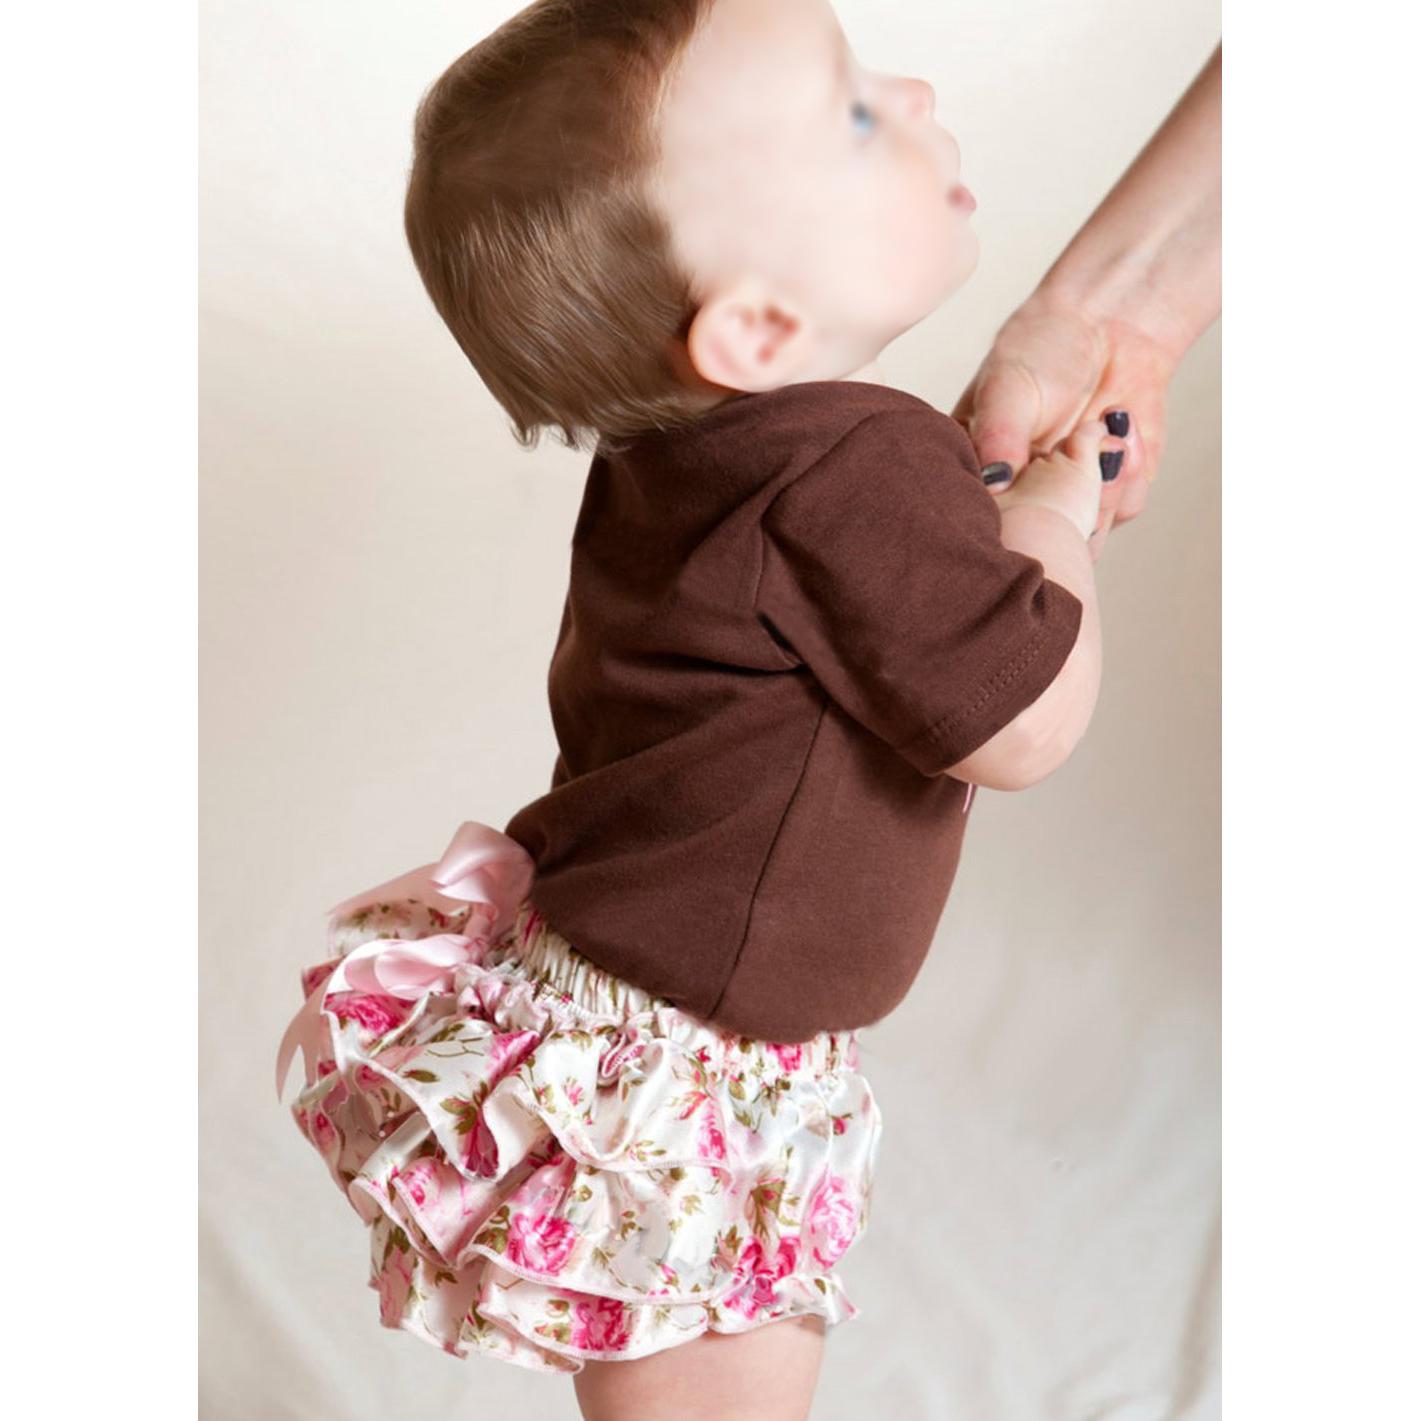 5x baby maedchen rosa bowknot ruesche hose pumphose windel decken s ebay. Black Bedroom Furniture Sets. Home Design Ideas